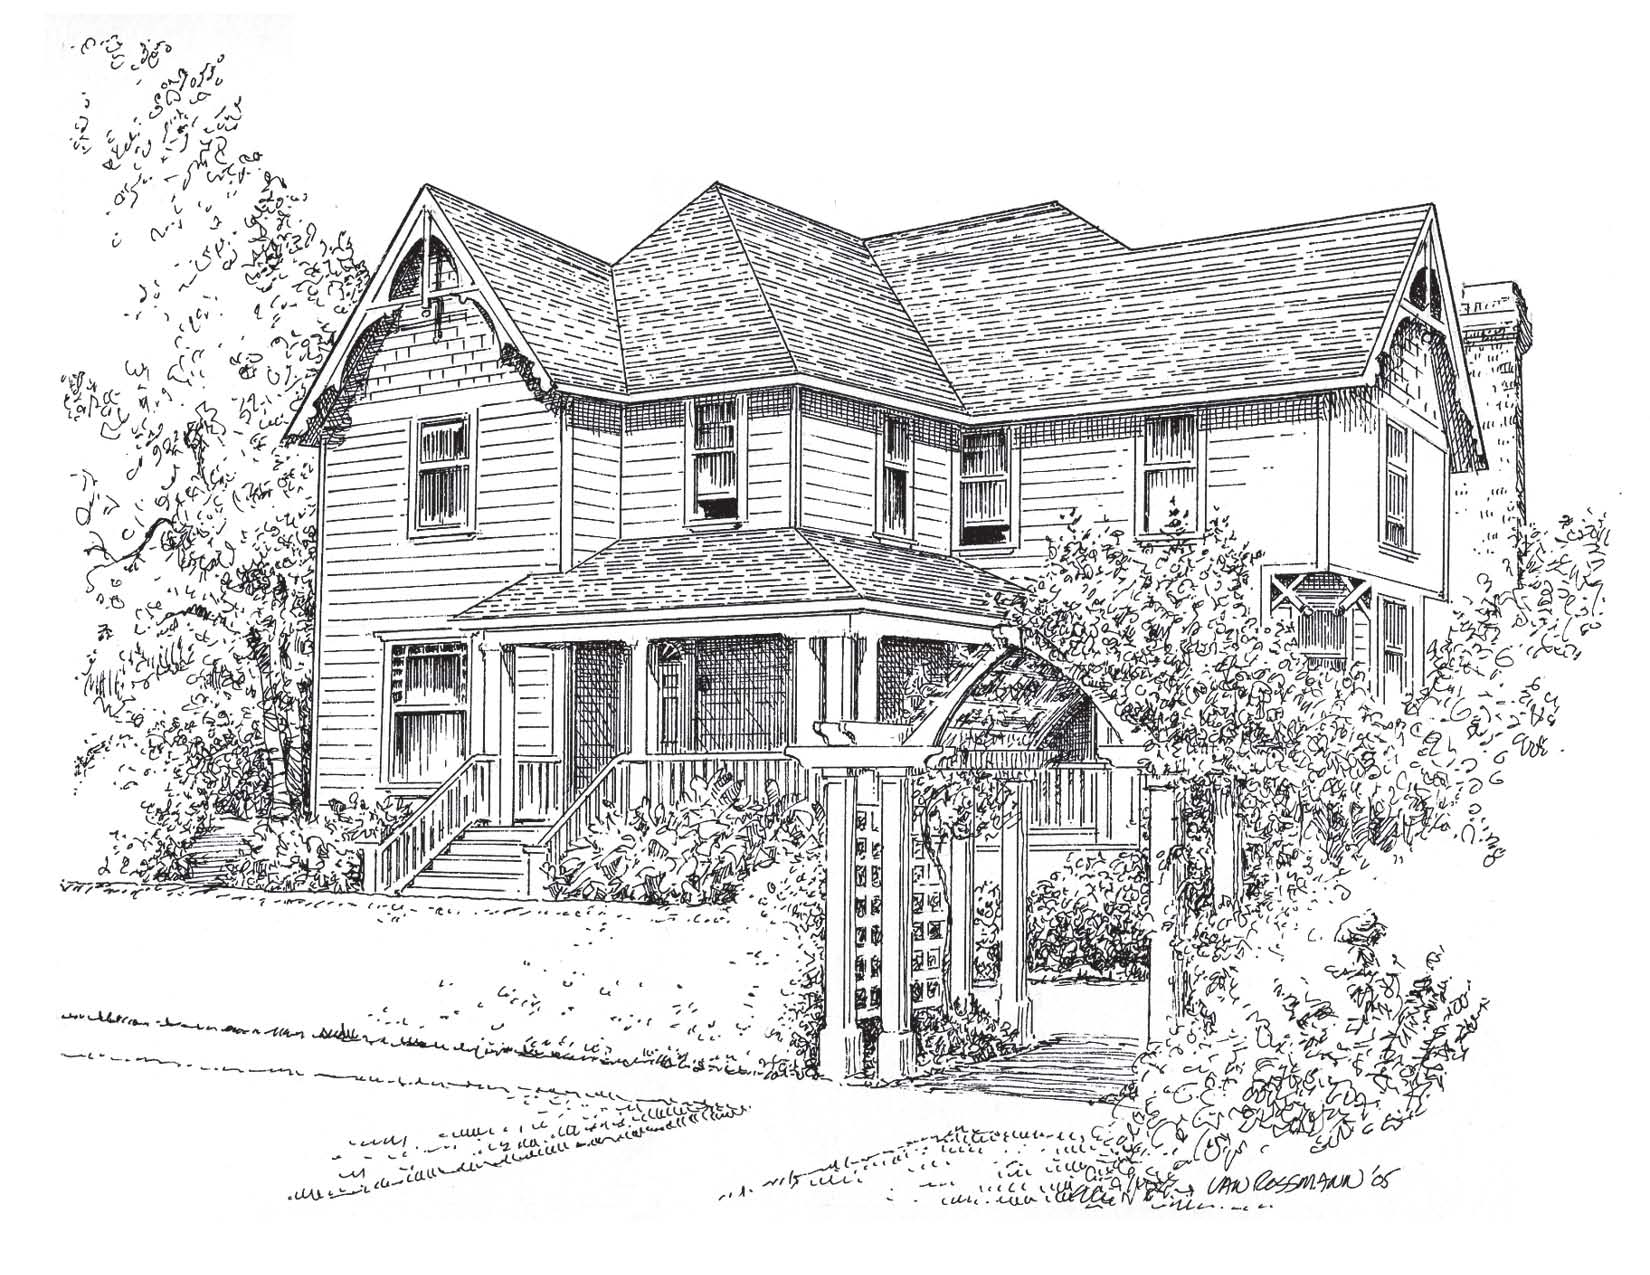 206 NW 8th Street, Corvallis, Oregon-Wells-Savage House By Rusty Van Rossmann